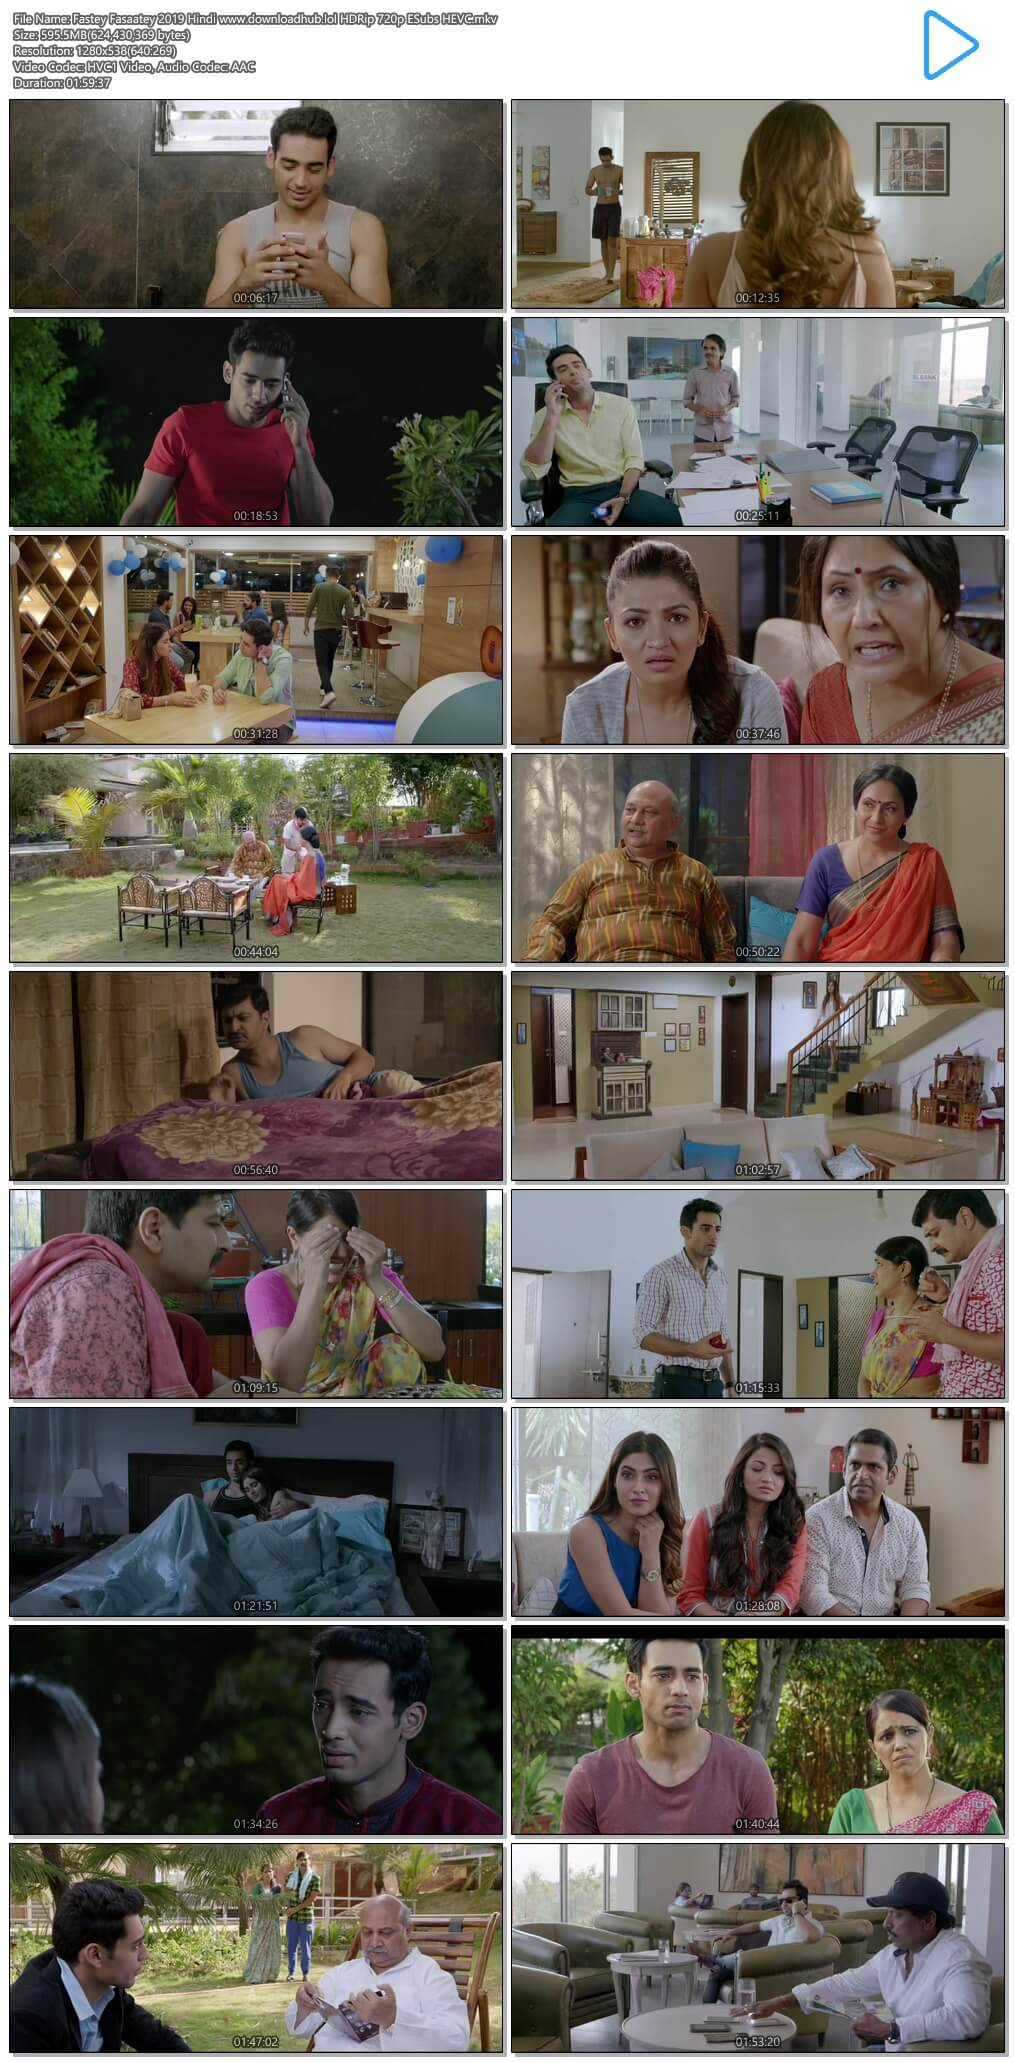 Fastey Fasaatey 2019 Hindi 600MB HDRip 720p ESubs HEVC